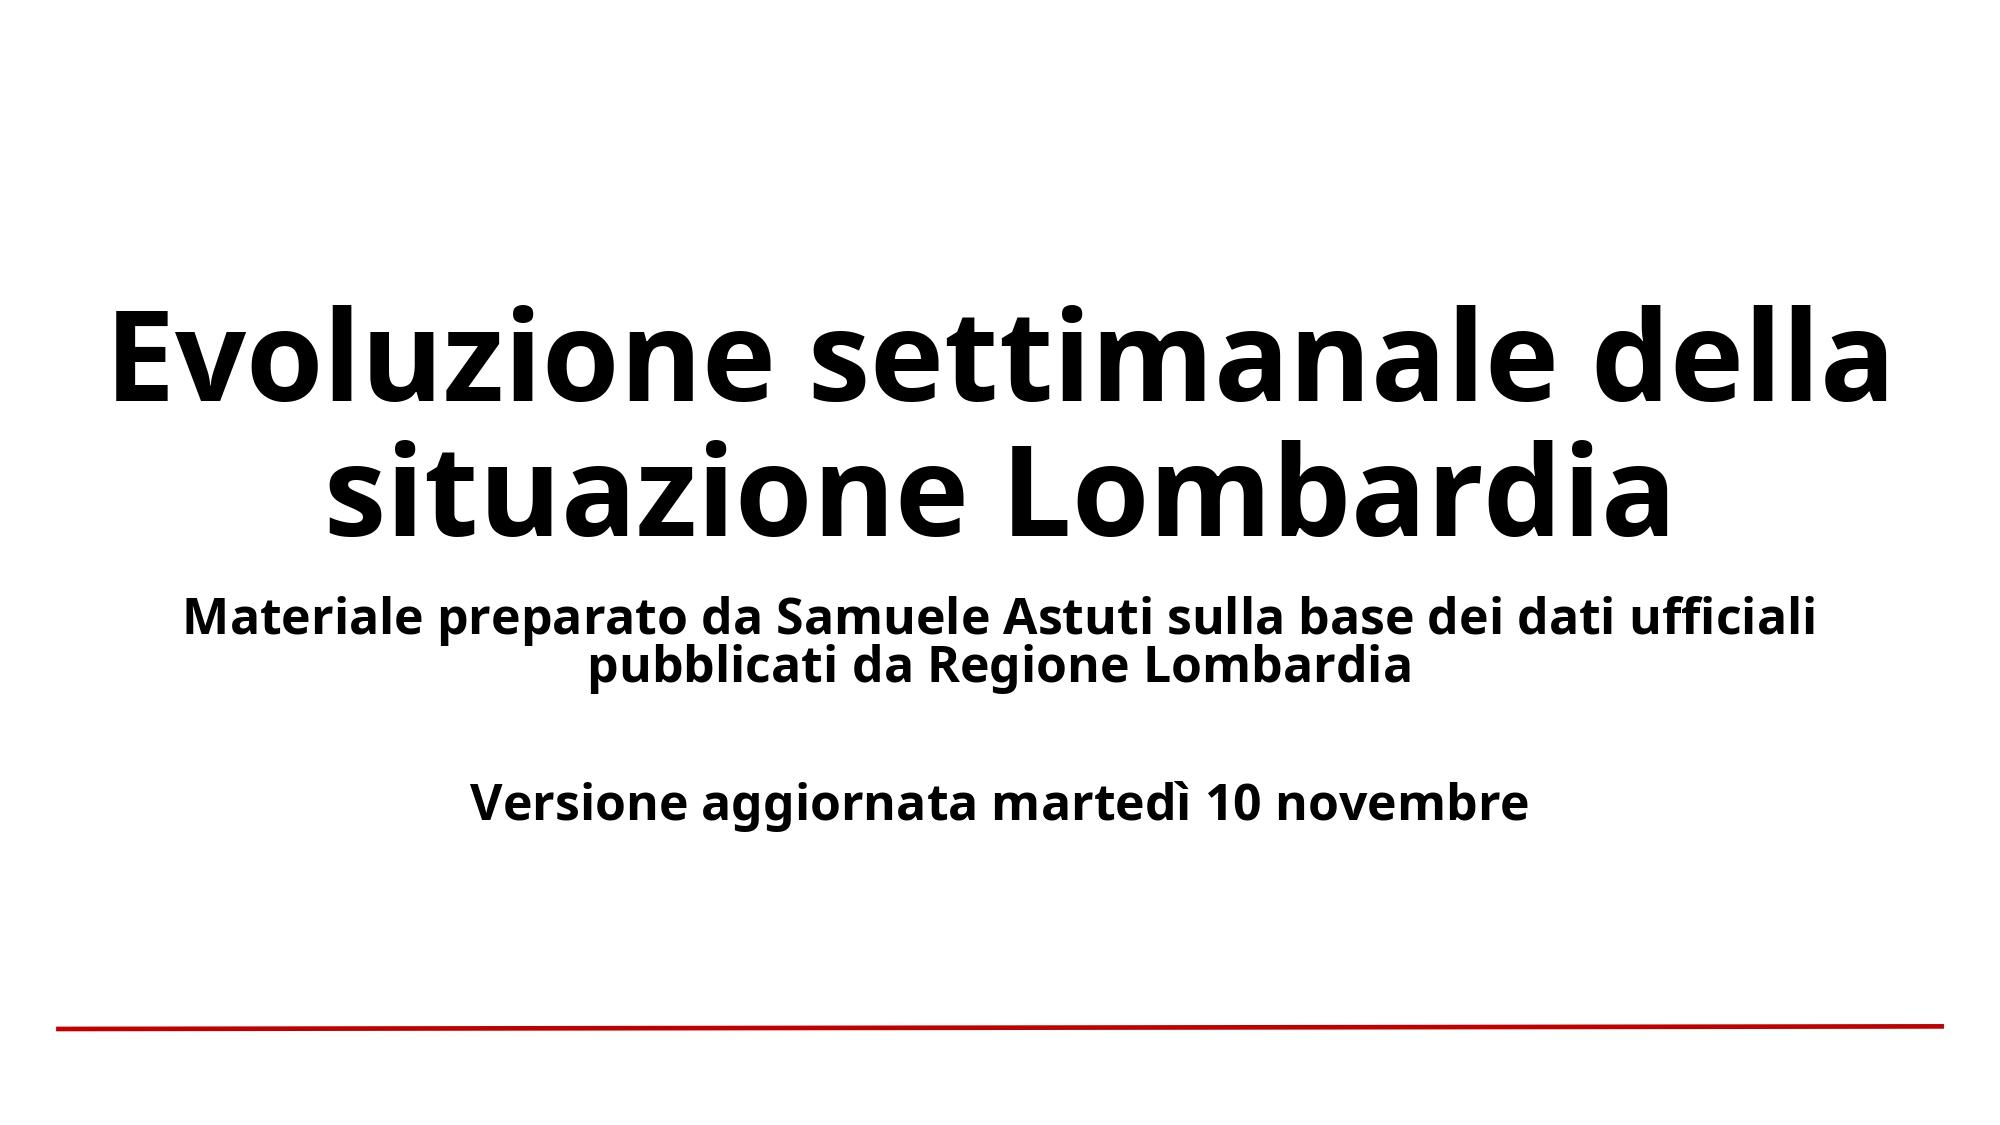 201110-EvoluzioneSettimanaleLombardia_page-0001